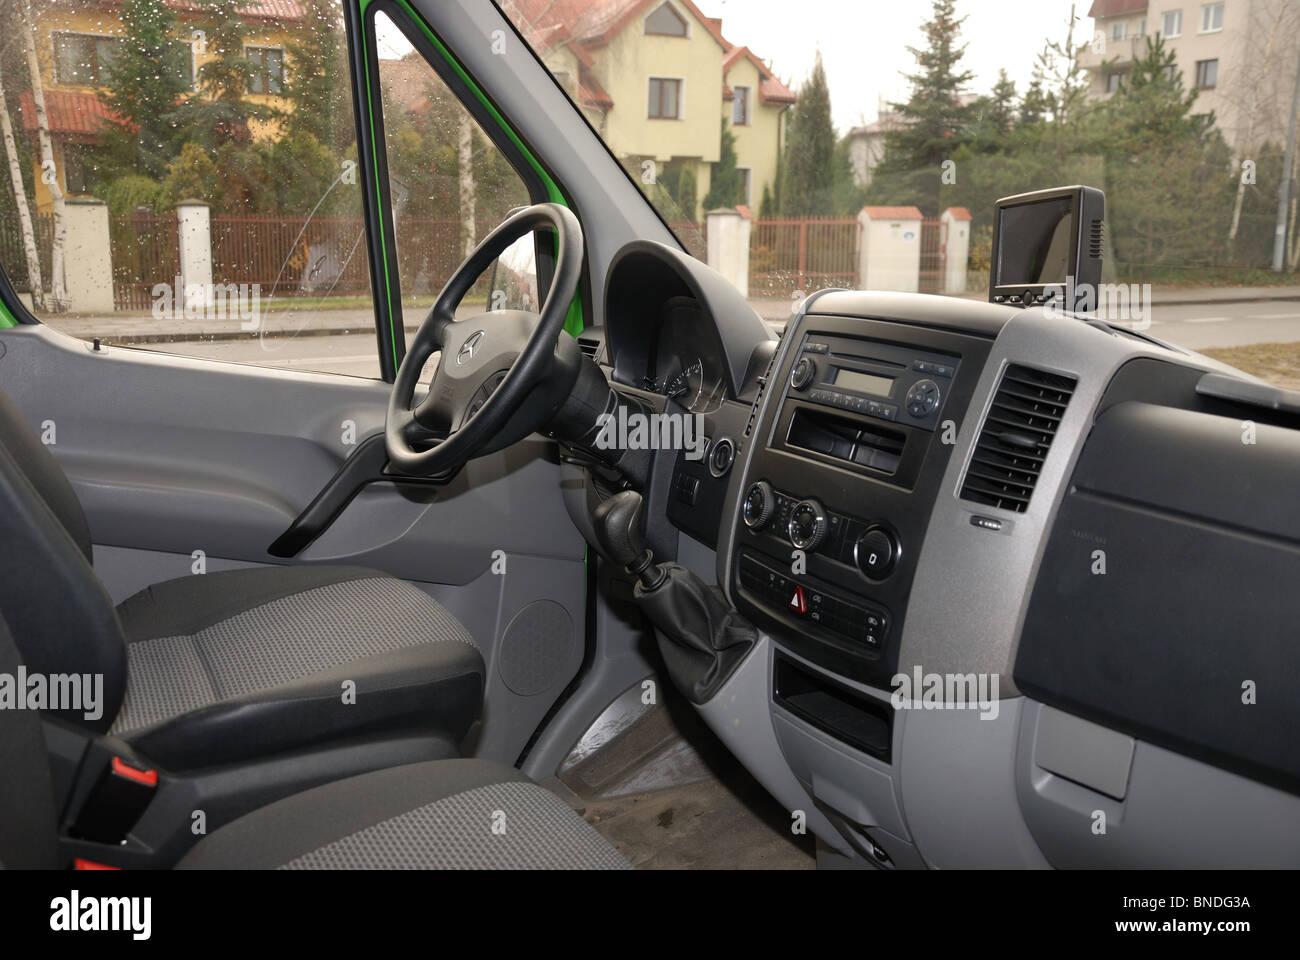 https://c8.alamy.com/compde/bndg3a/mercedes-benz-sprinter-260-cdi-van-grun-l3h2-deutsch-mcv-van-interieur-kabine-dashboard-bndg3a.jpg